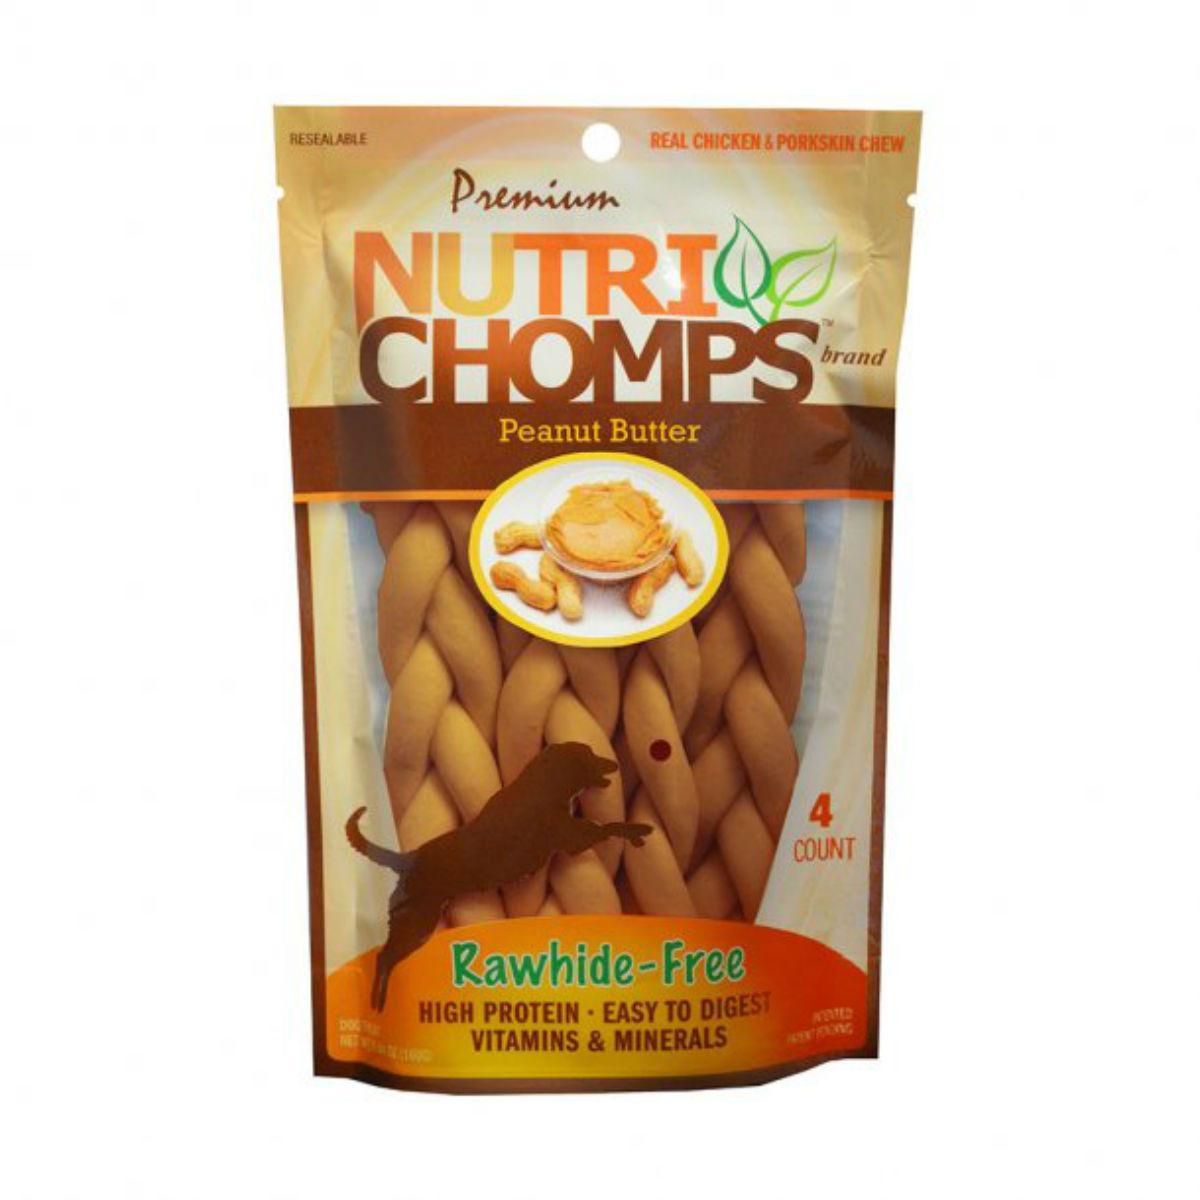 Nutri Chomps Braid Dog Treats - Peanut Butter